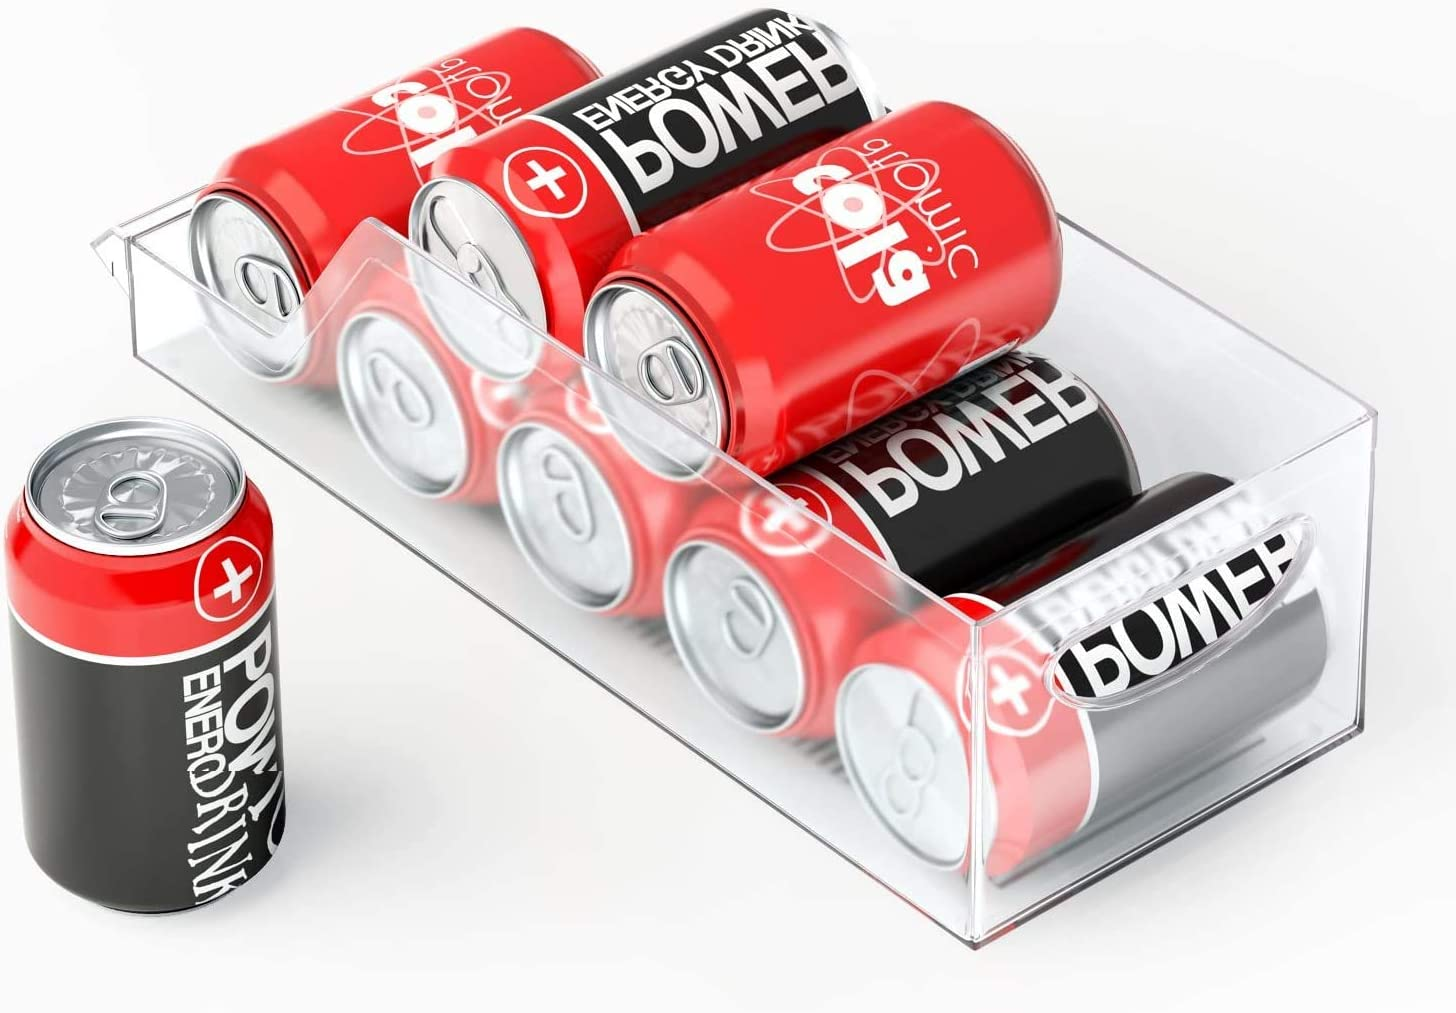 M-Better Fridge Storage Box Freezer Food Storage Box, [BPA-Free] Plastic Refrigerator Organizer Bins Squeeze for Kitchen Pantry, Cabinet, Refrigerator, Freezer